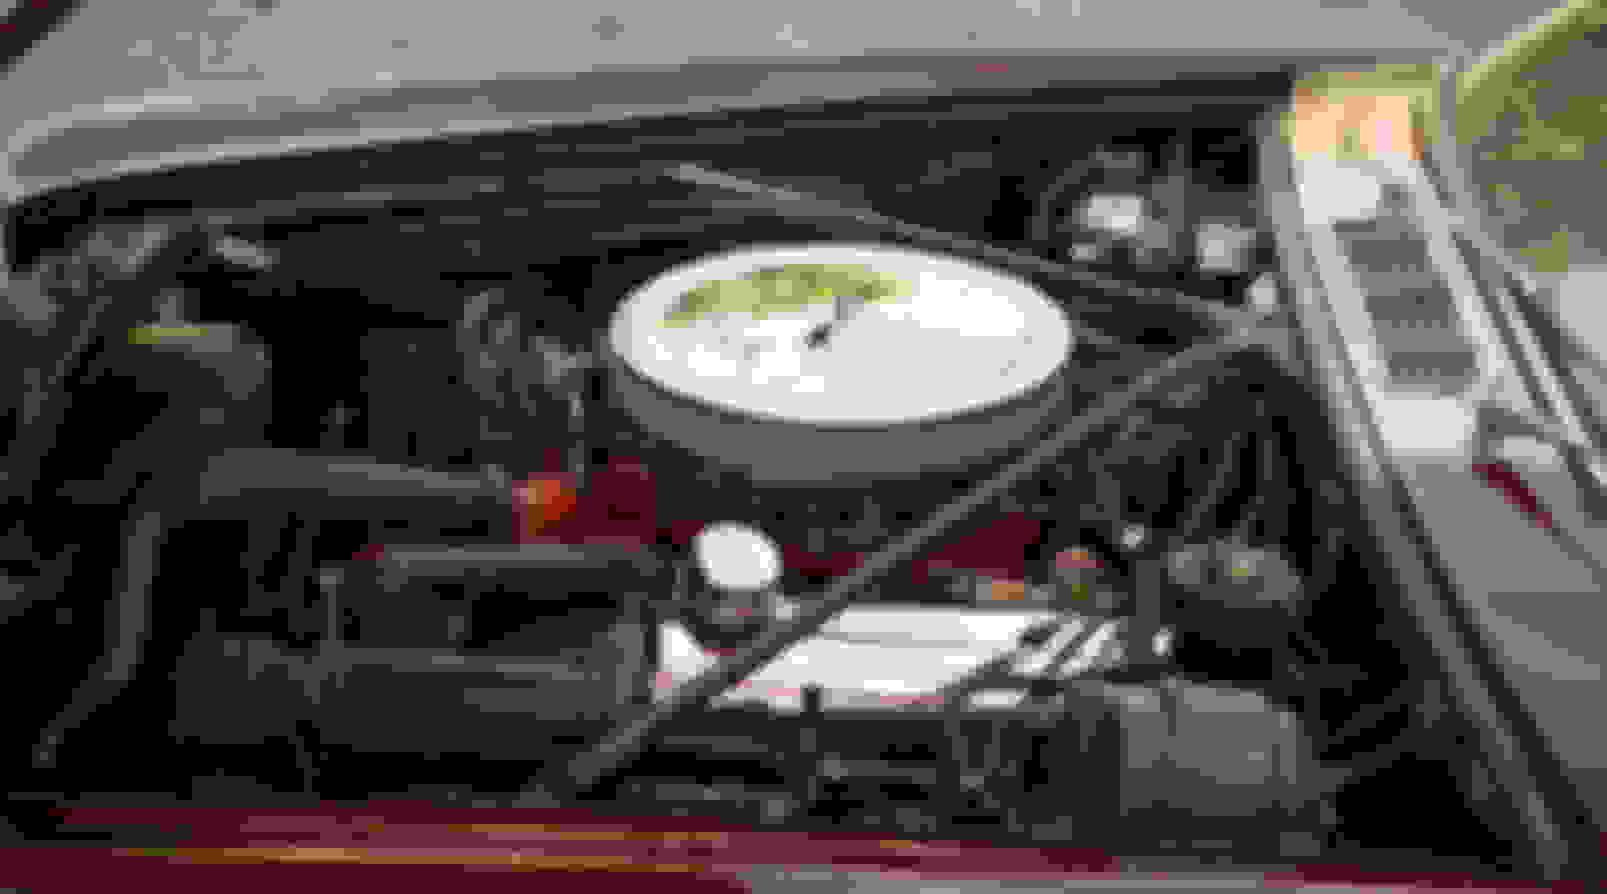 need Series 2 XJ12 wiring diagram - Jaguar Forums - Jaguar ... on